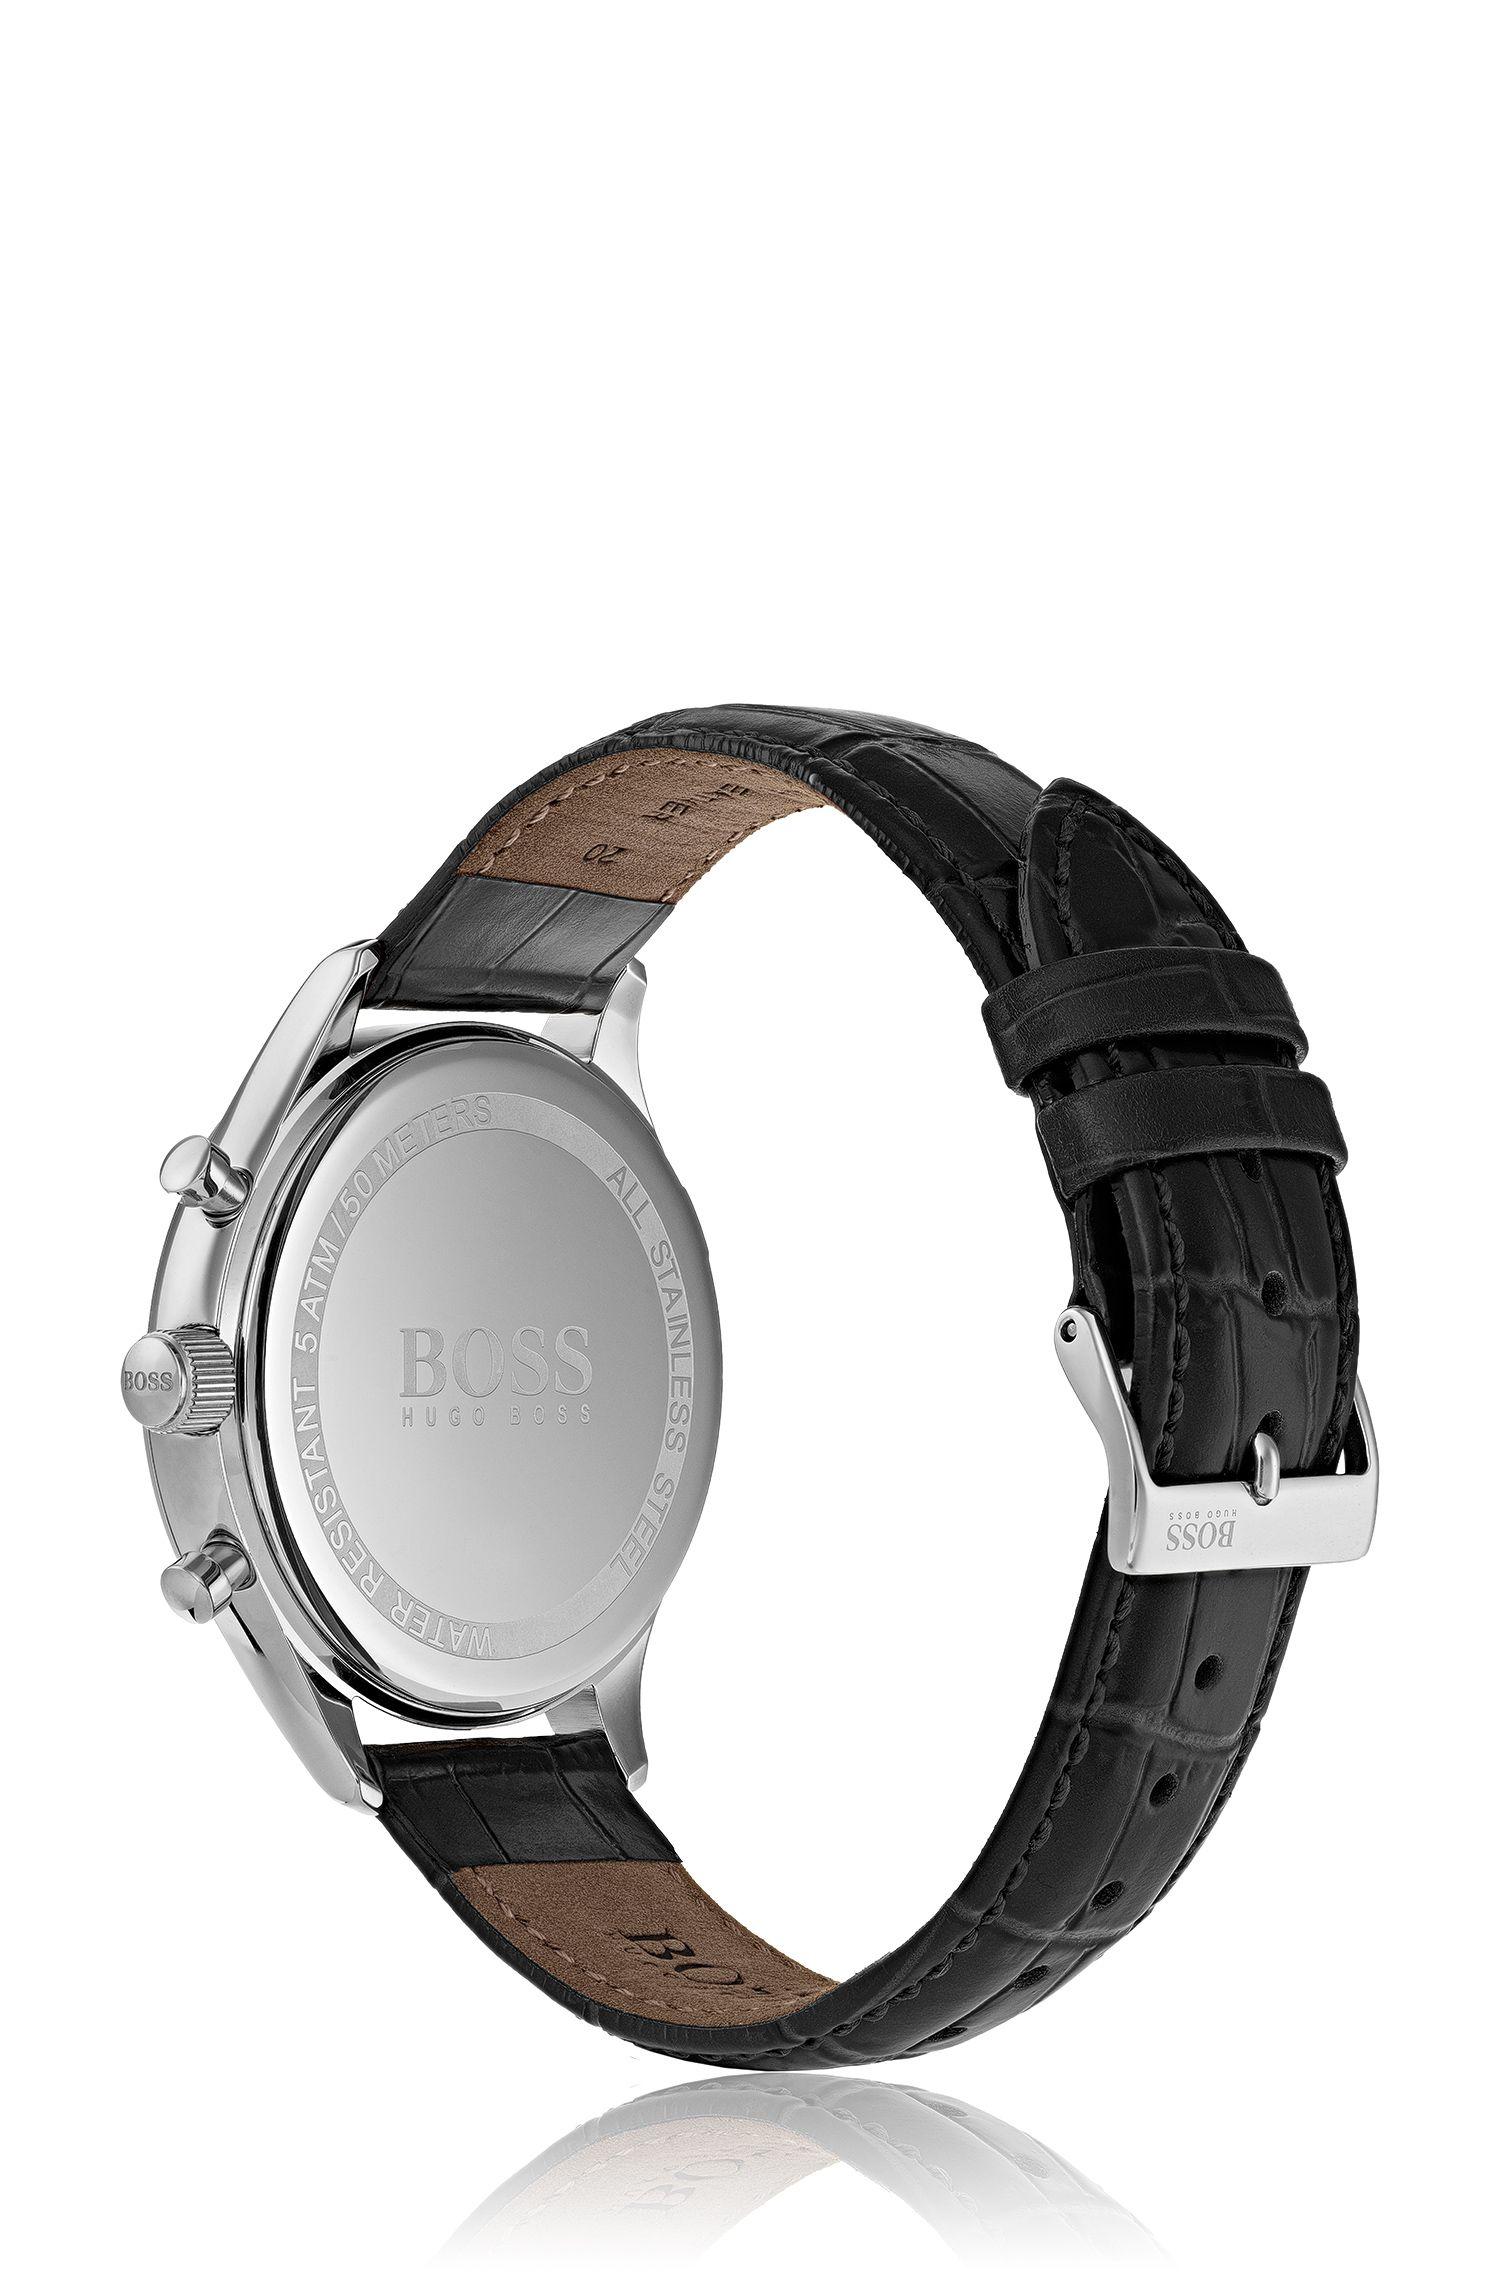 Montre en acier inoxydable avec bracelet en cuir noir